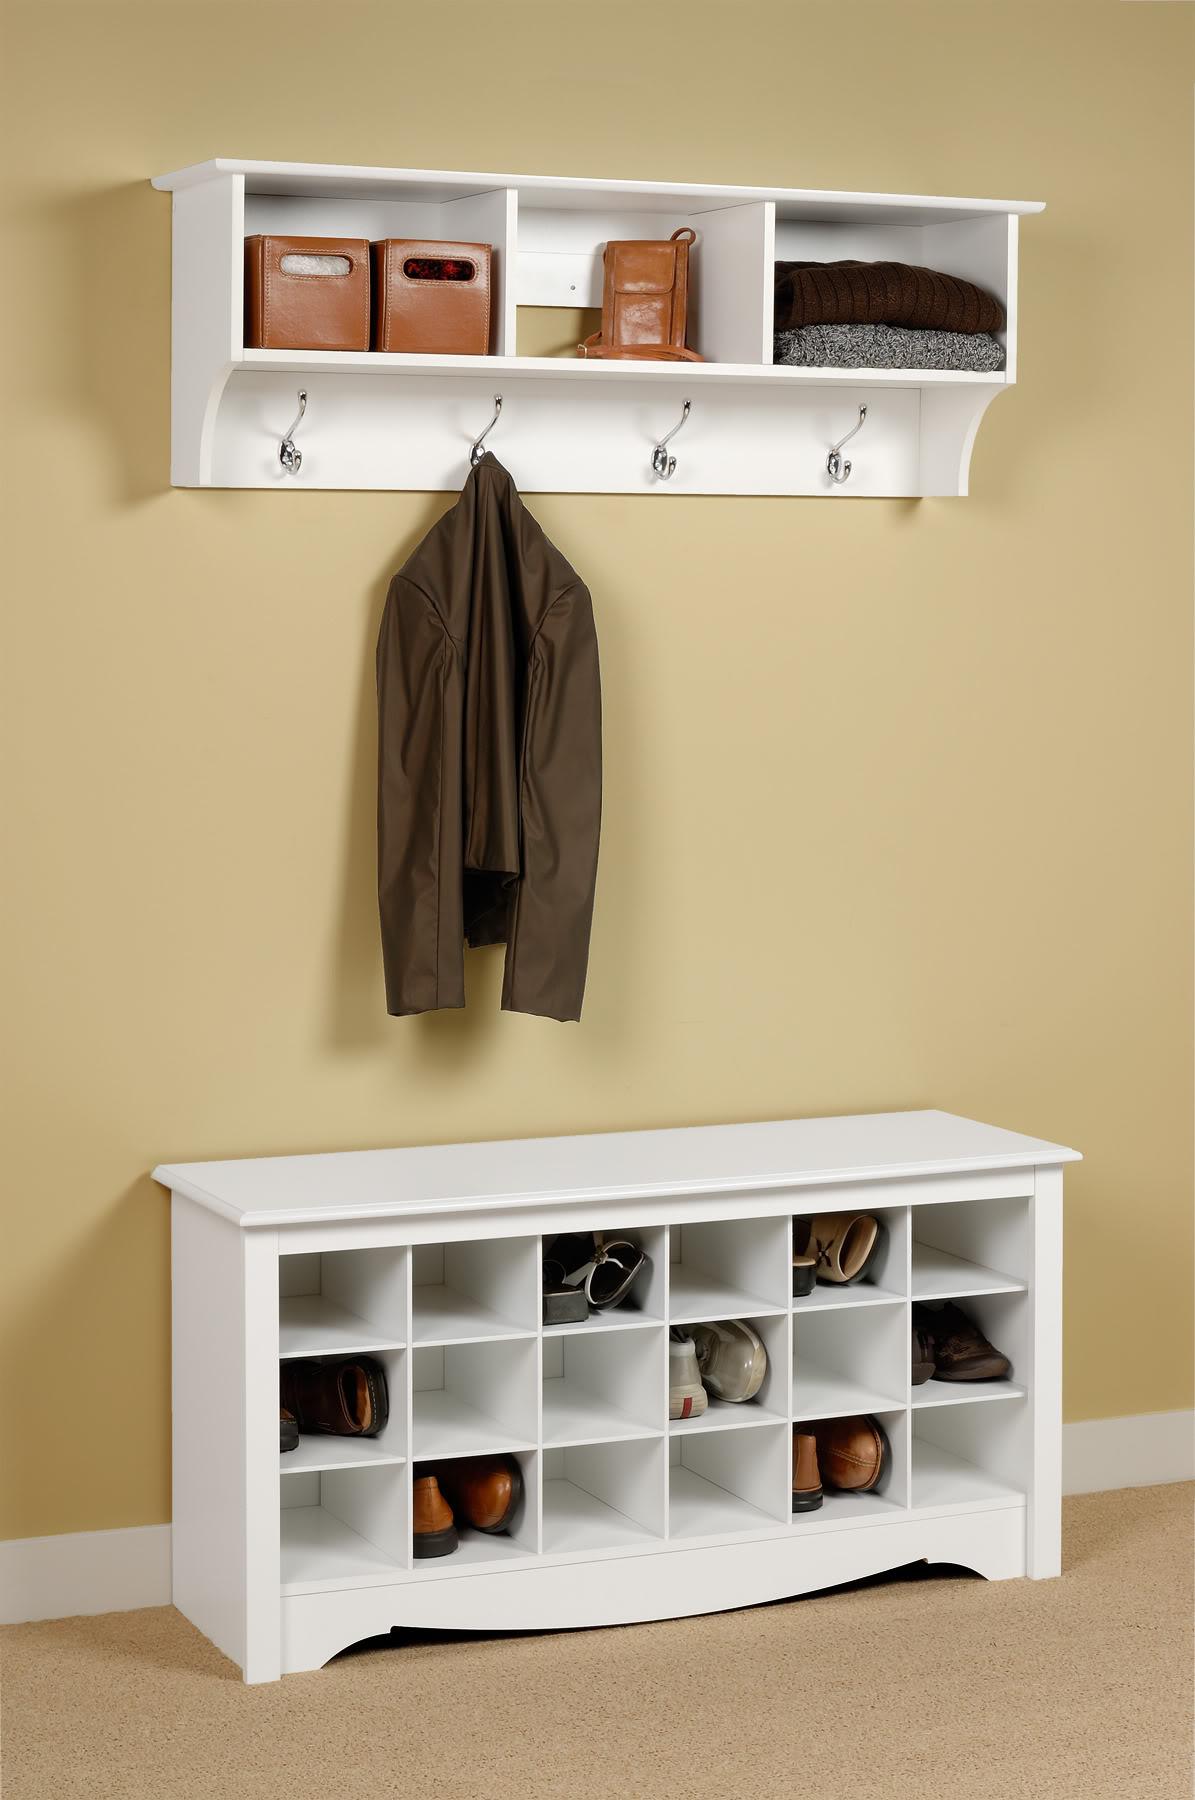 Amazing Wall Storage Units and Shelves 7 wall storage shelves